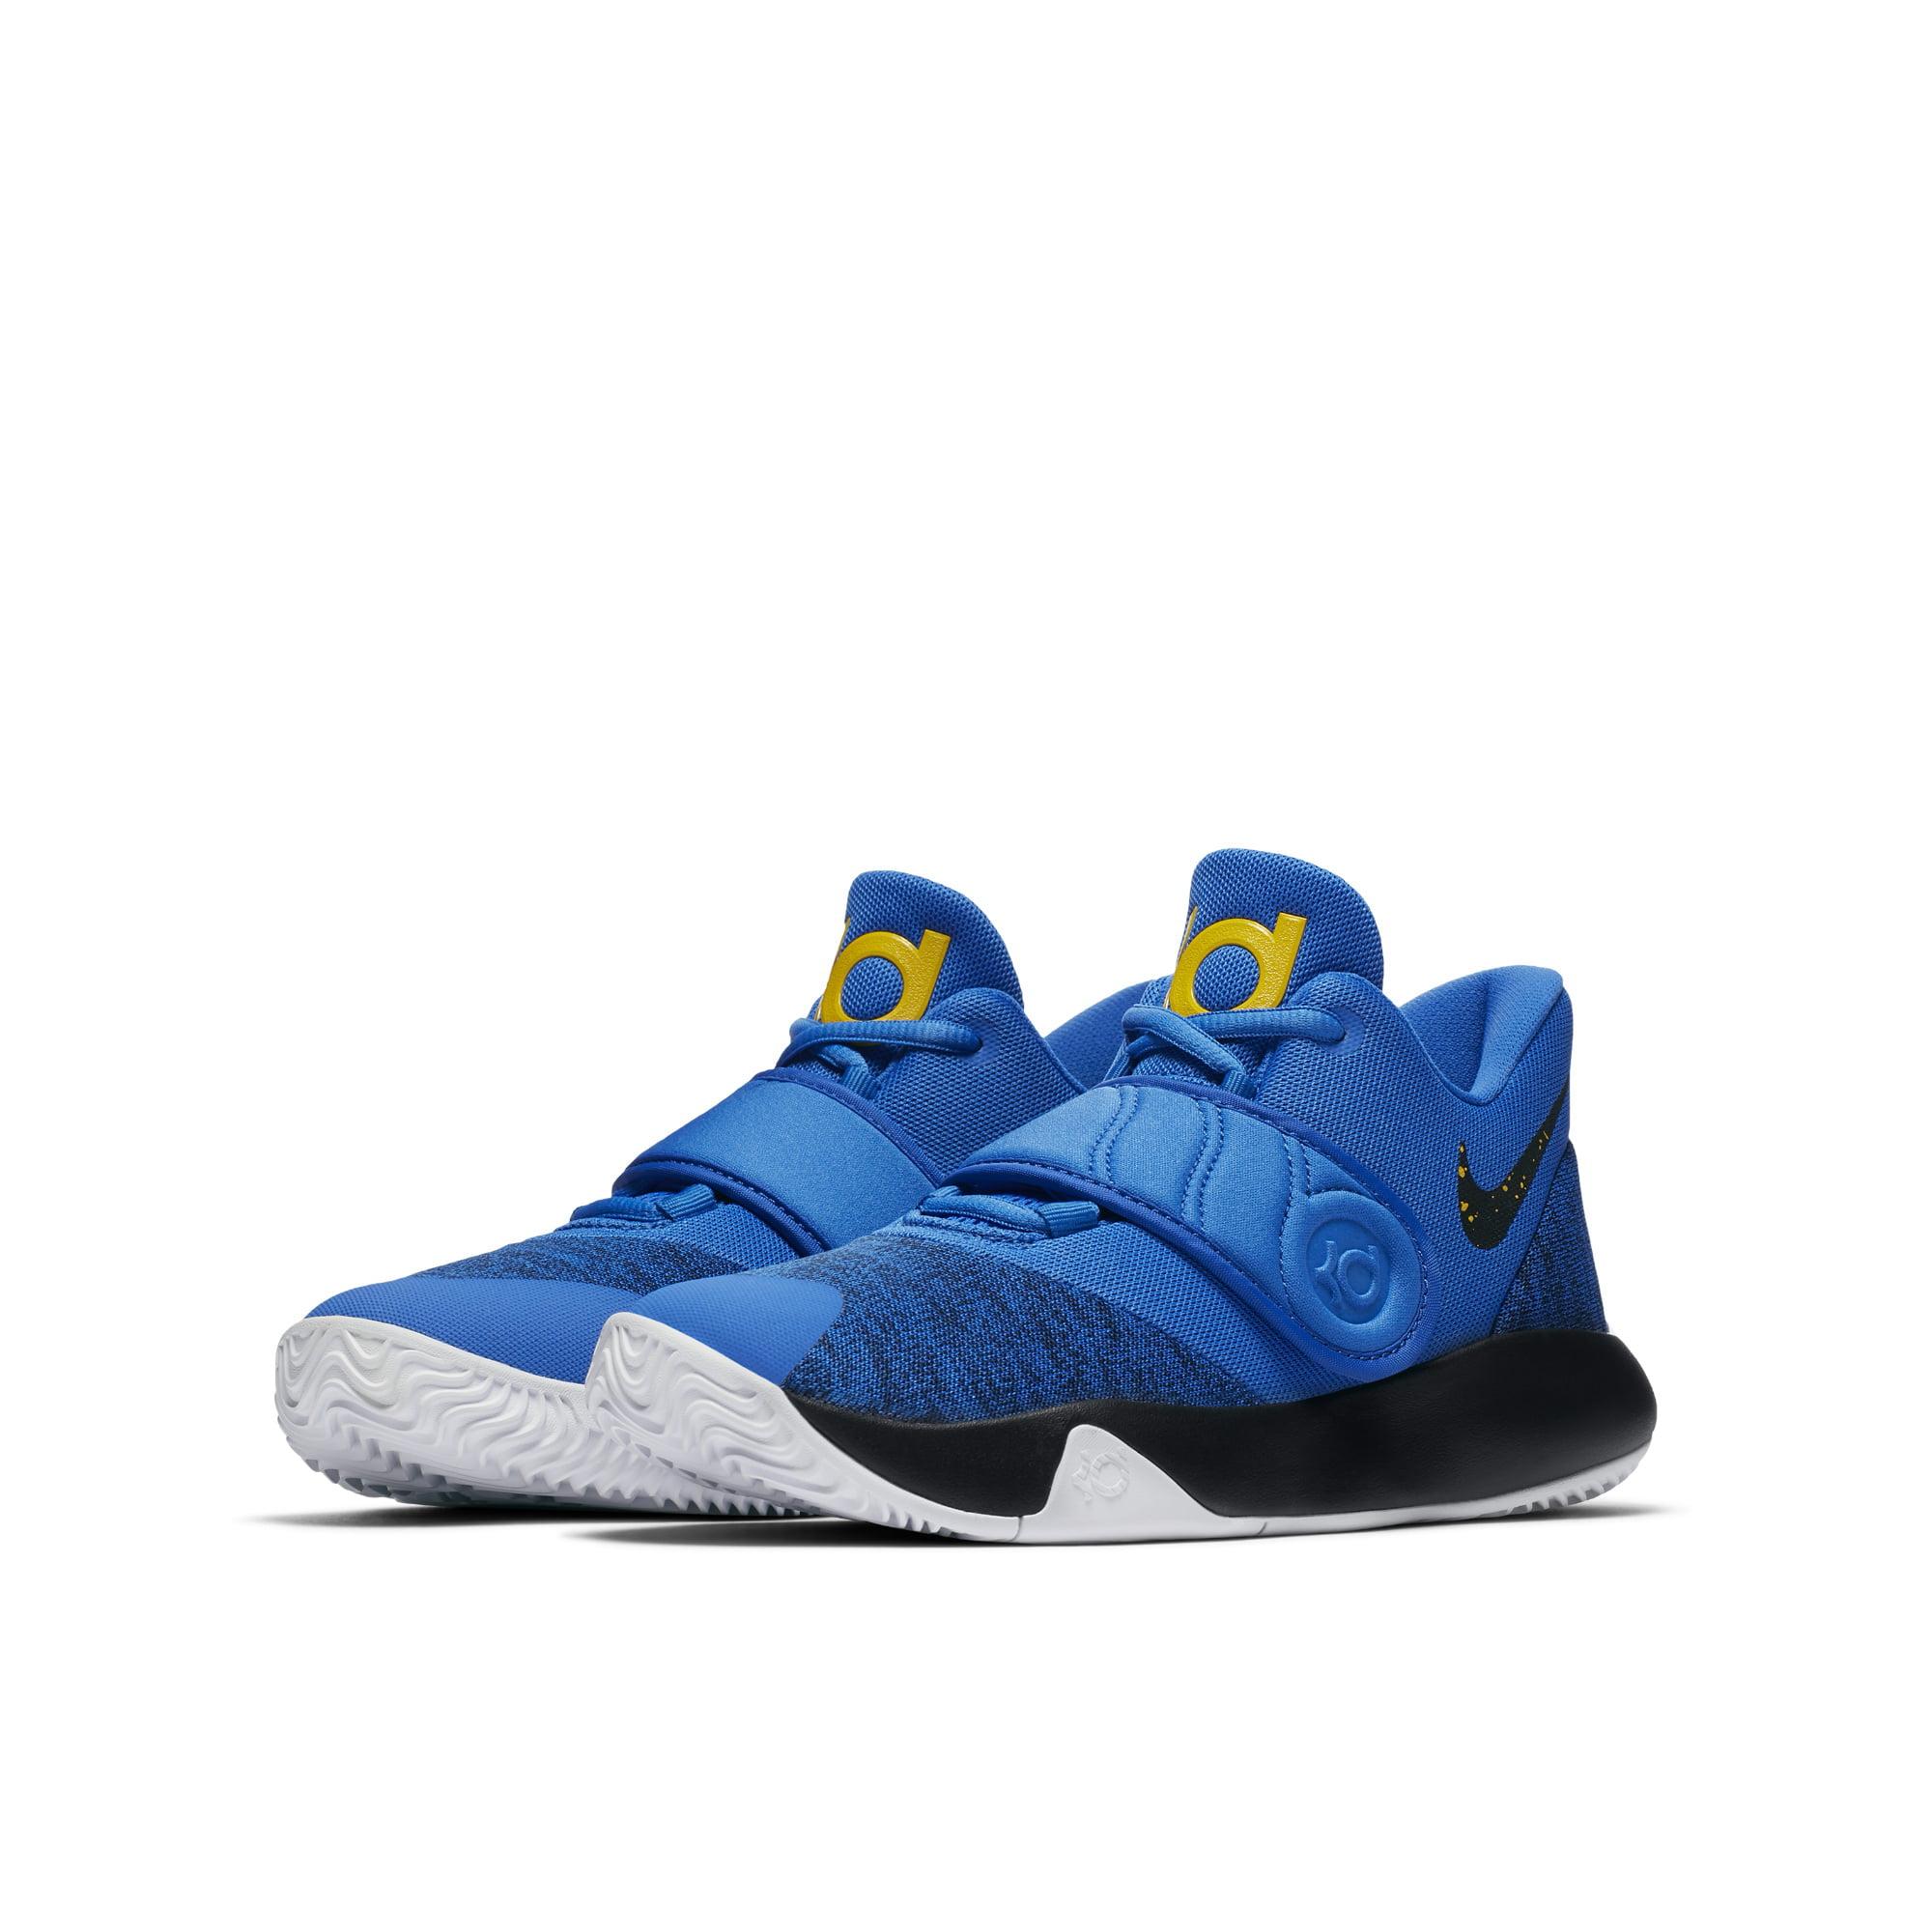 af3703840812 ... new zealand nike kd trey 5 vi gs boys grade schl sneakers ah7172 401  walmart f3ede ...